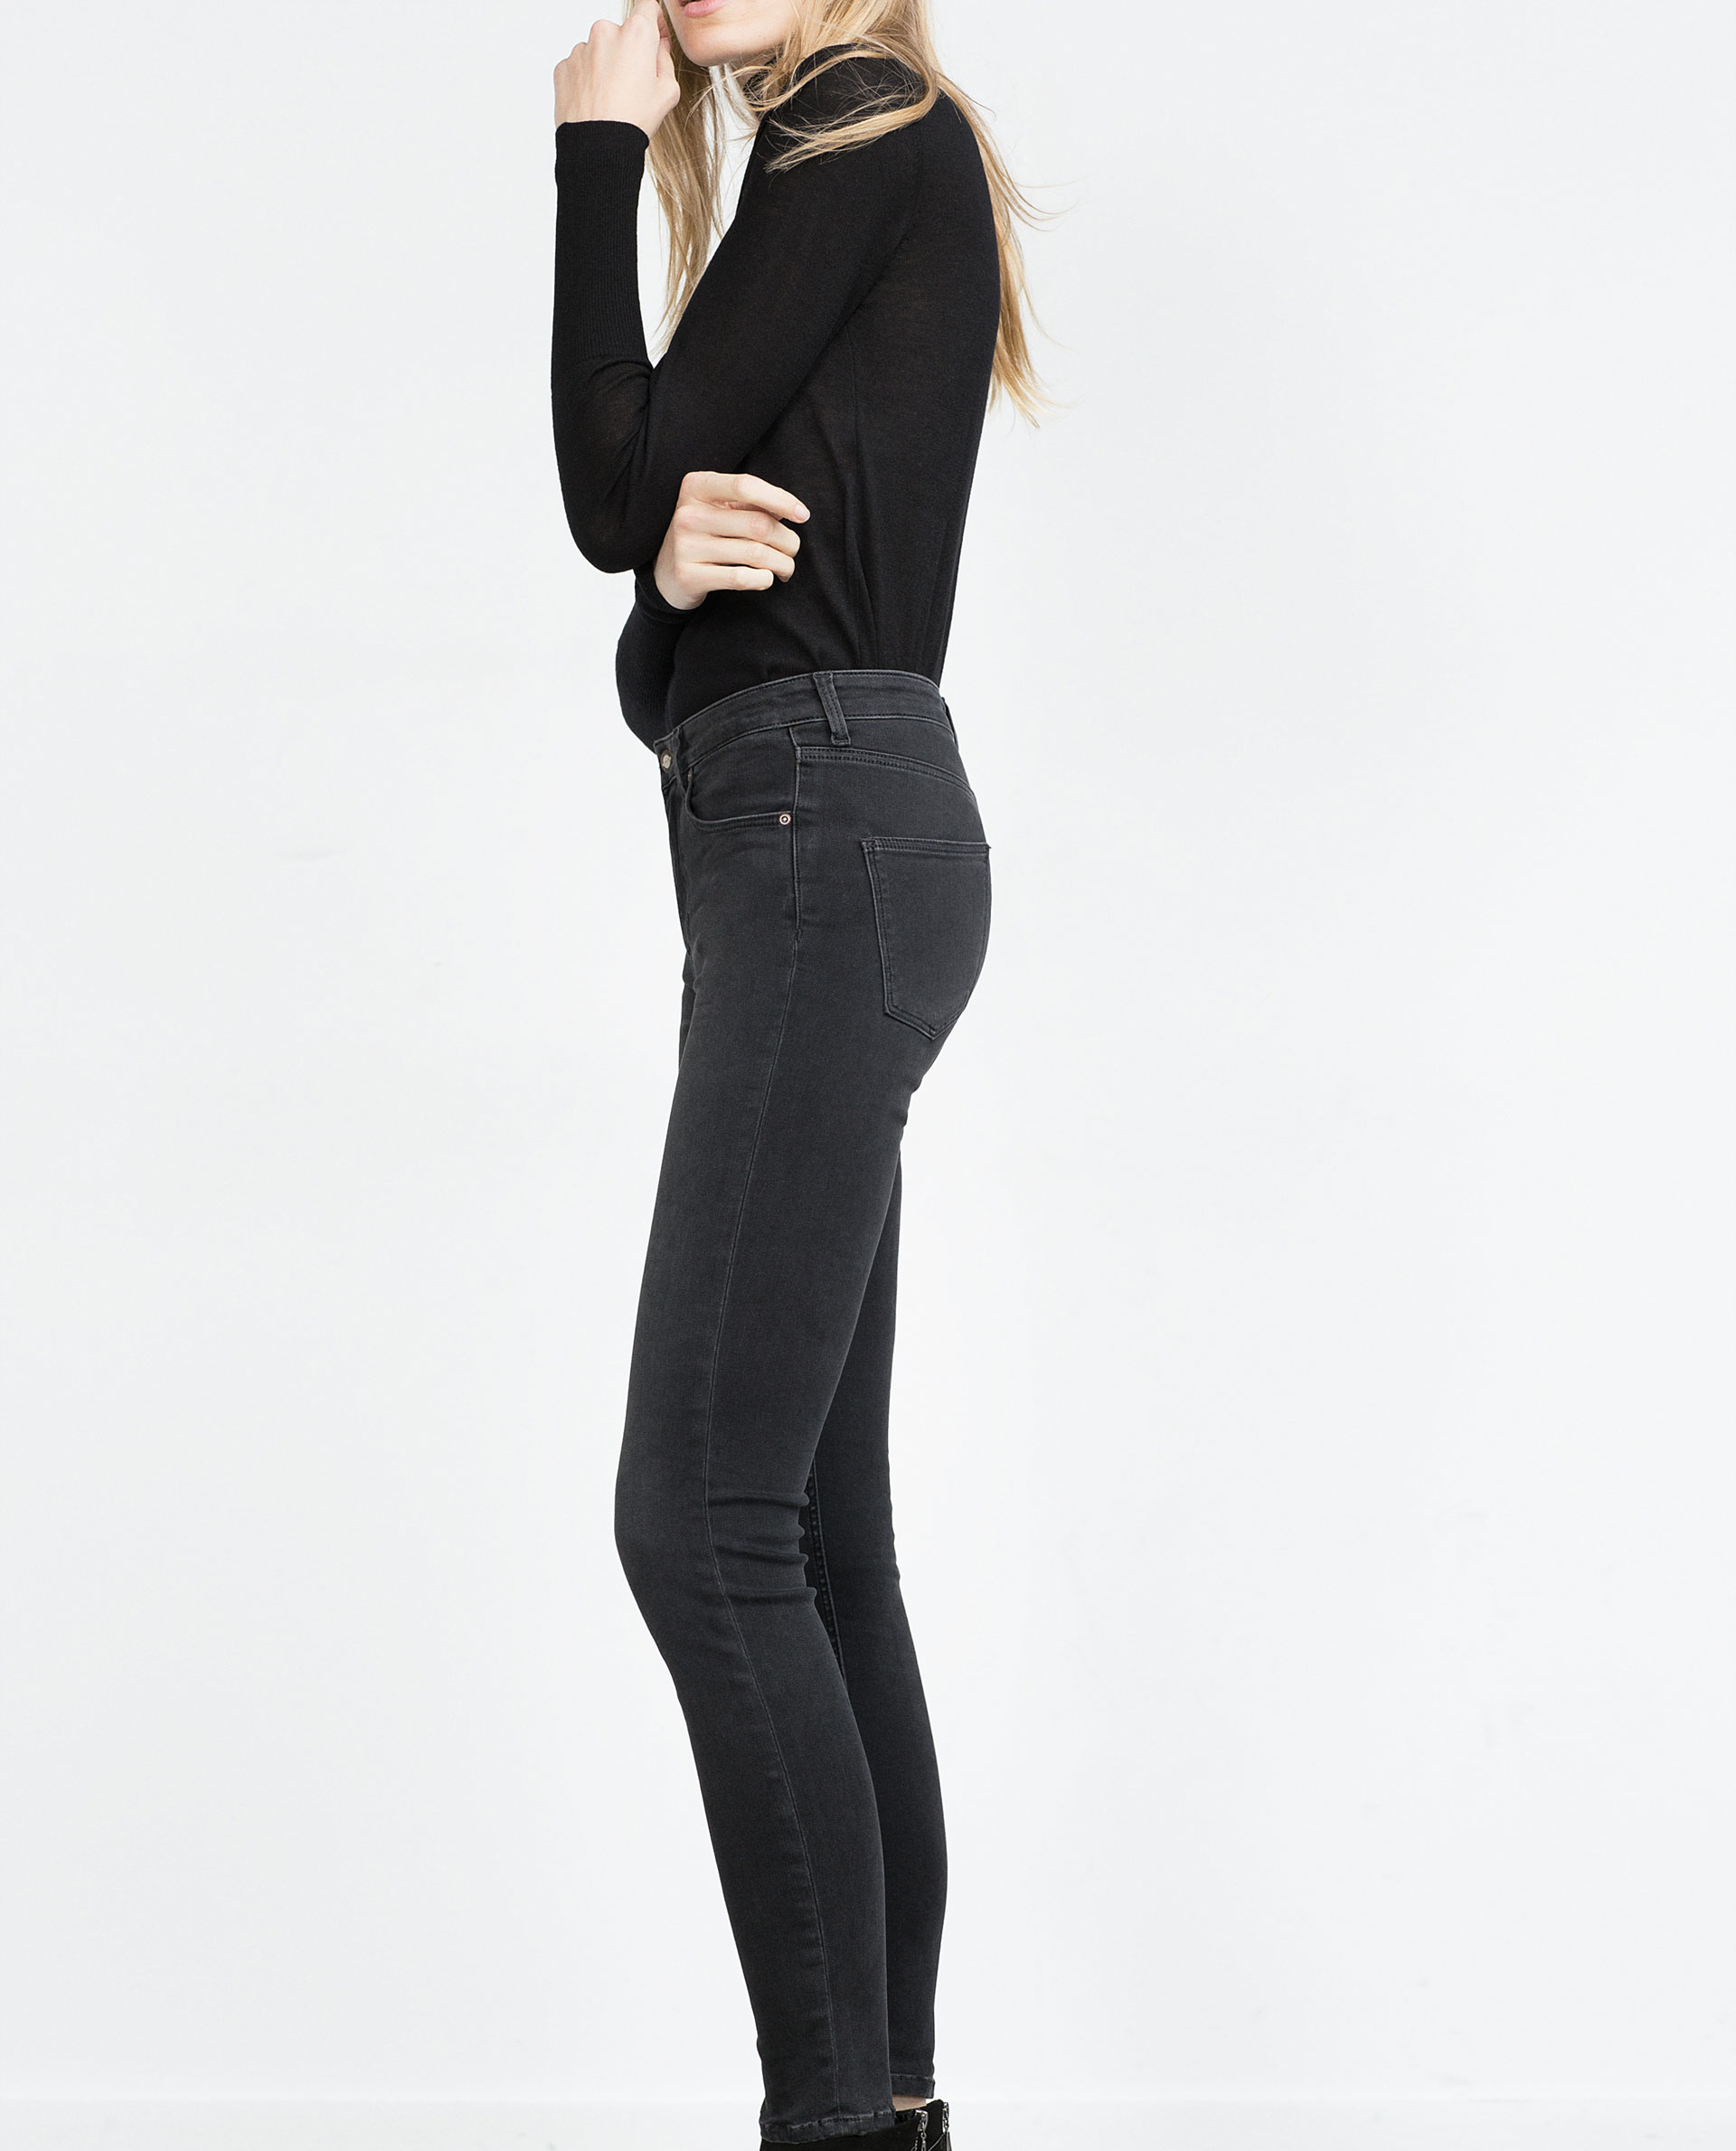 New Zara Spring 2015 Women Lookbook Fringed Suede Jacket